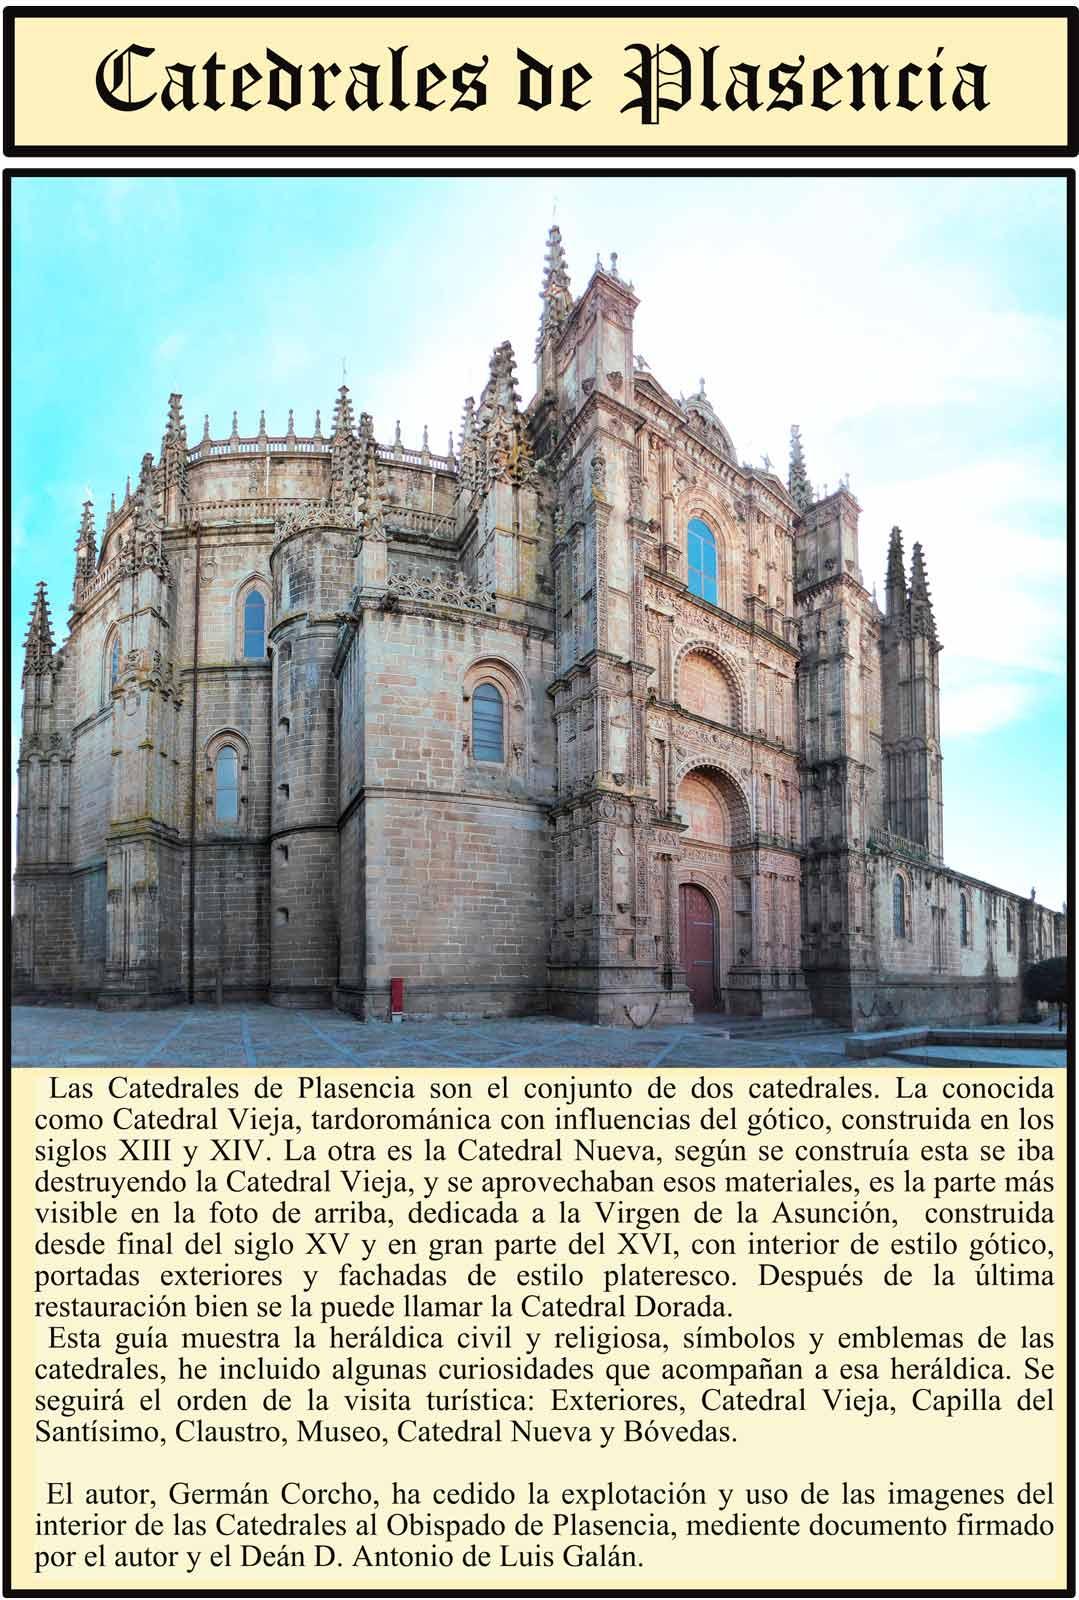 Catedrales de Plasencia Exterior Historia